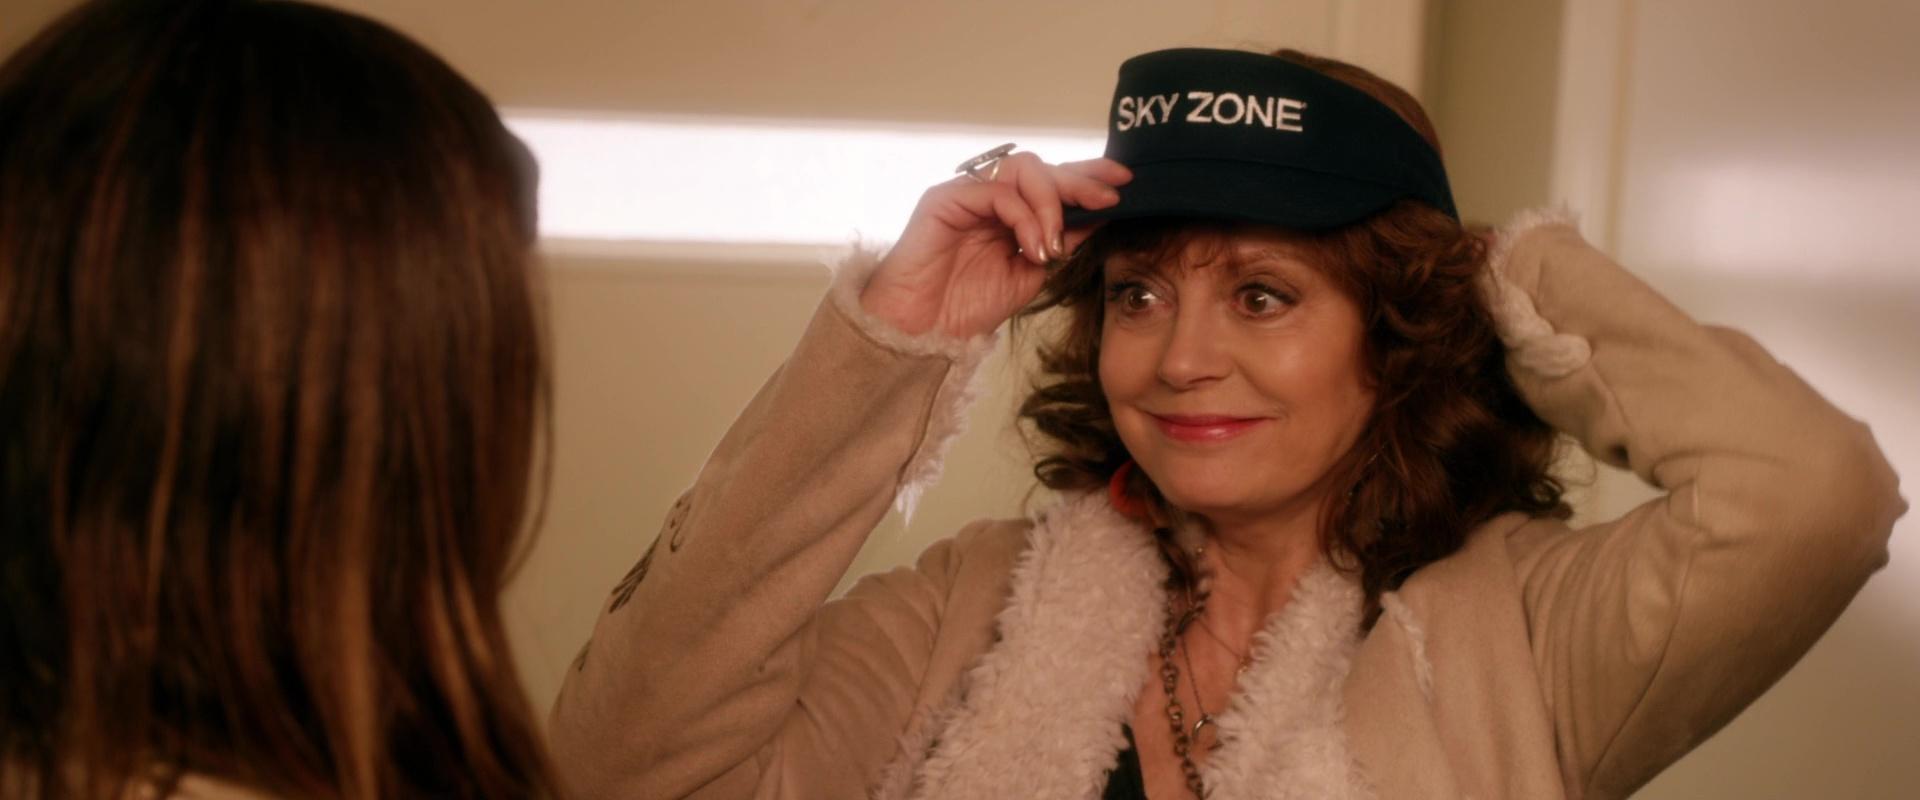 Bad Moms Christmas Susan Sarandon.Sky Zone Cap Worn By Susan Sarandon In A Bad Moms Christmas